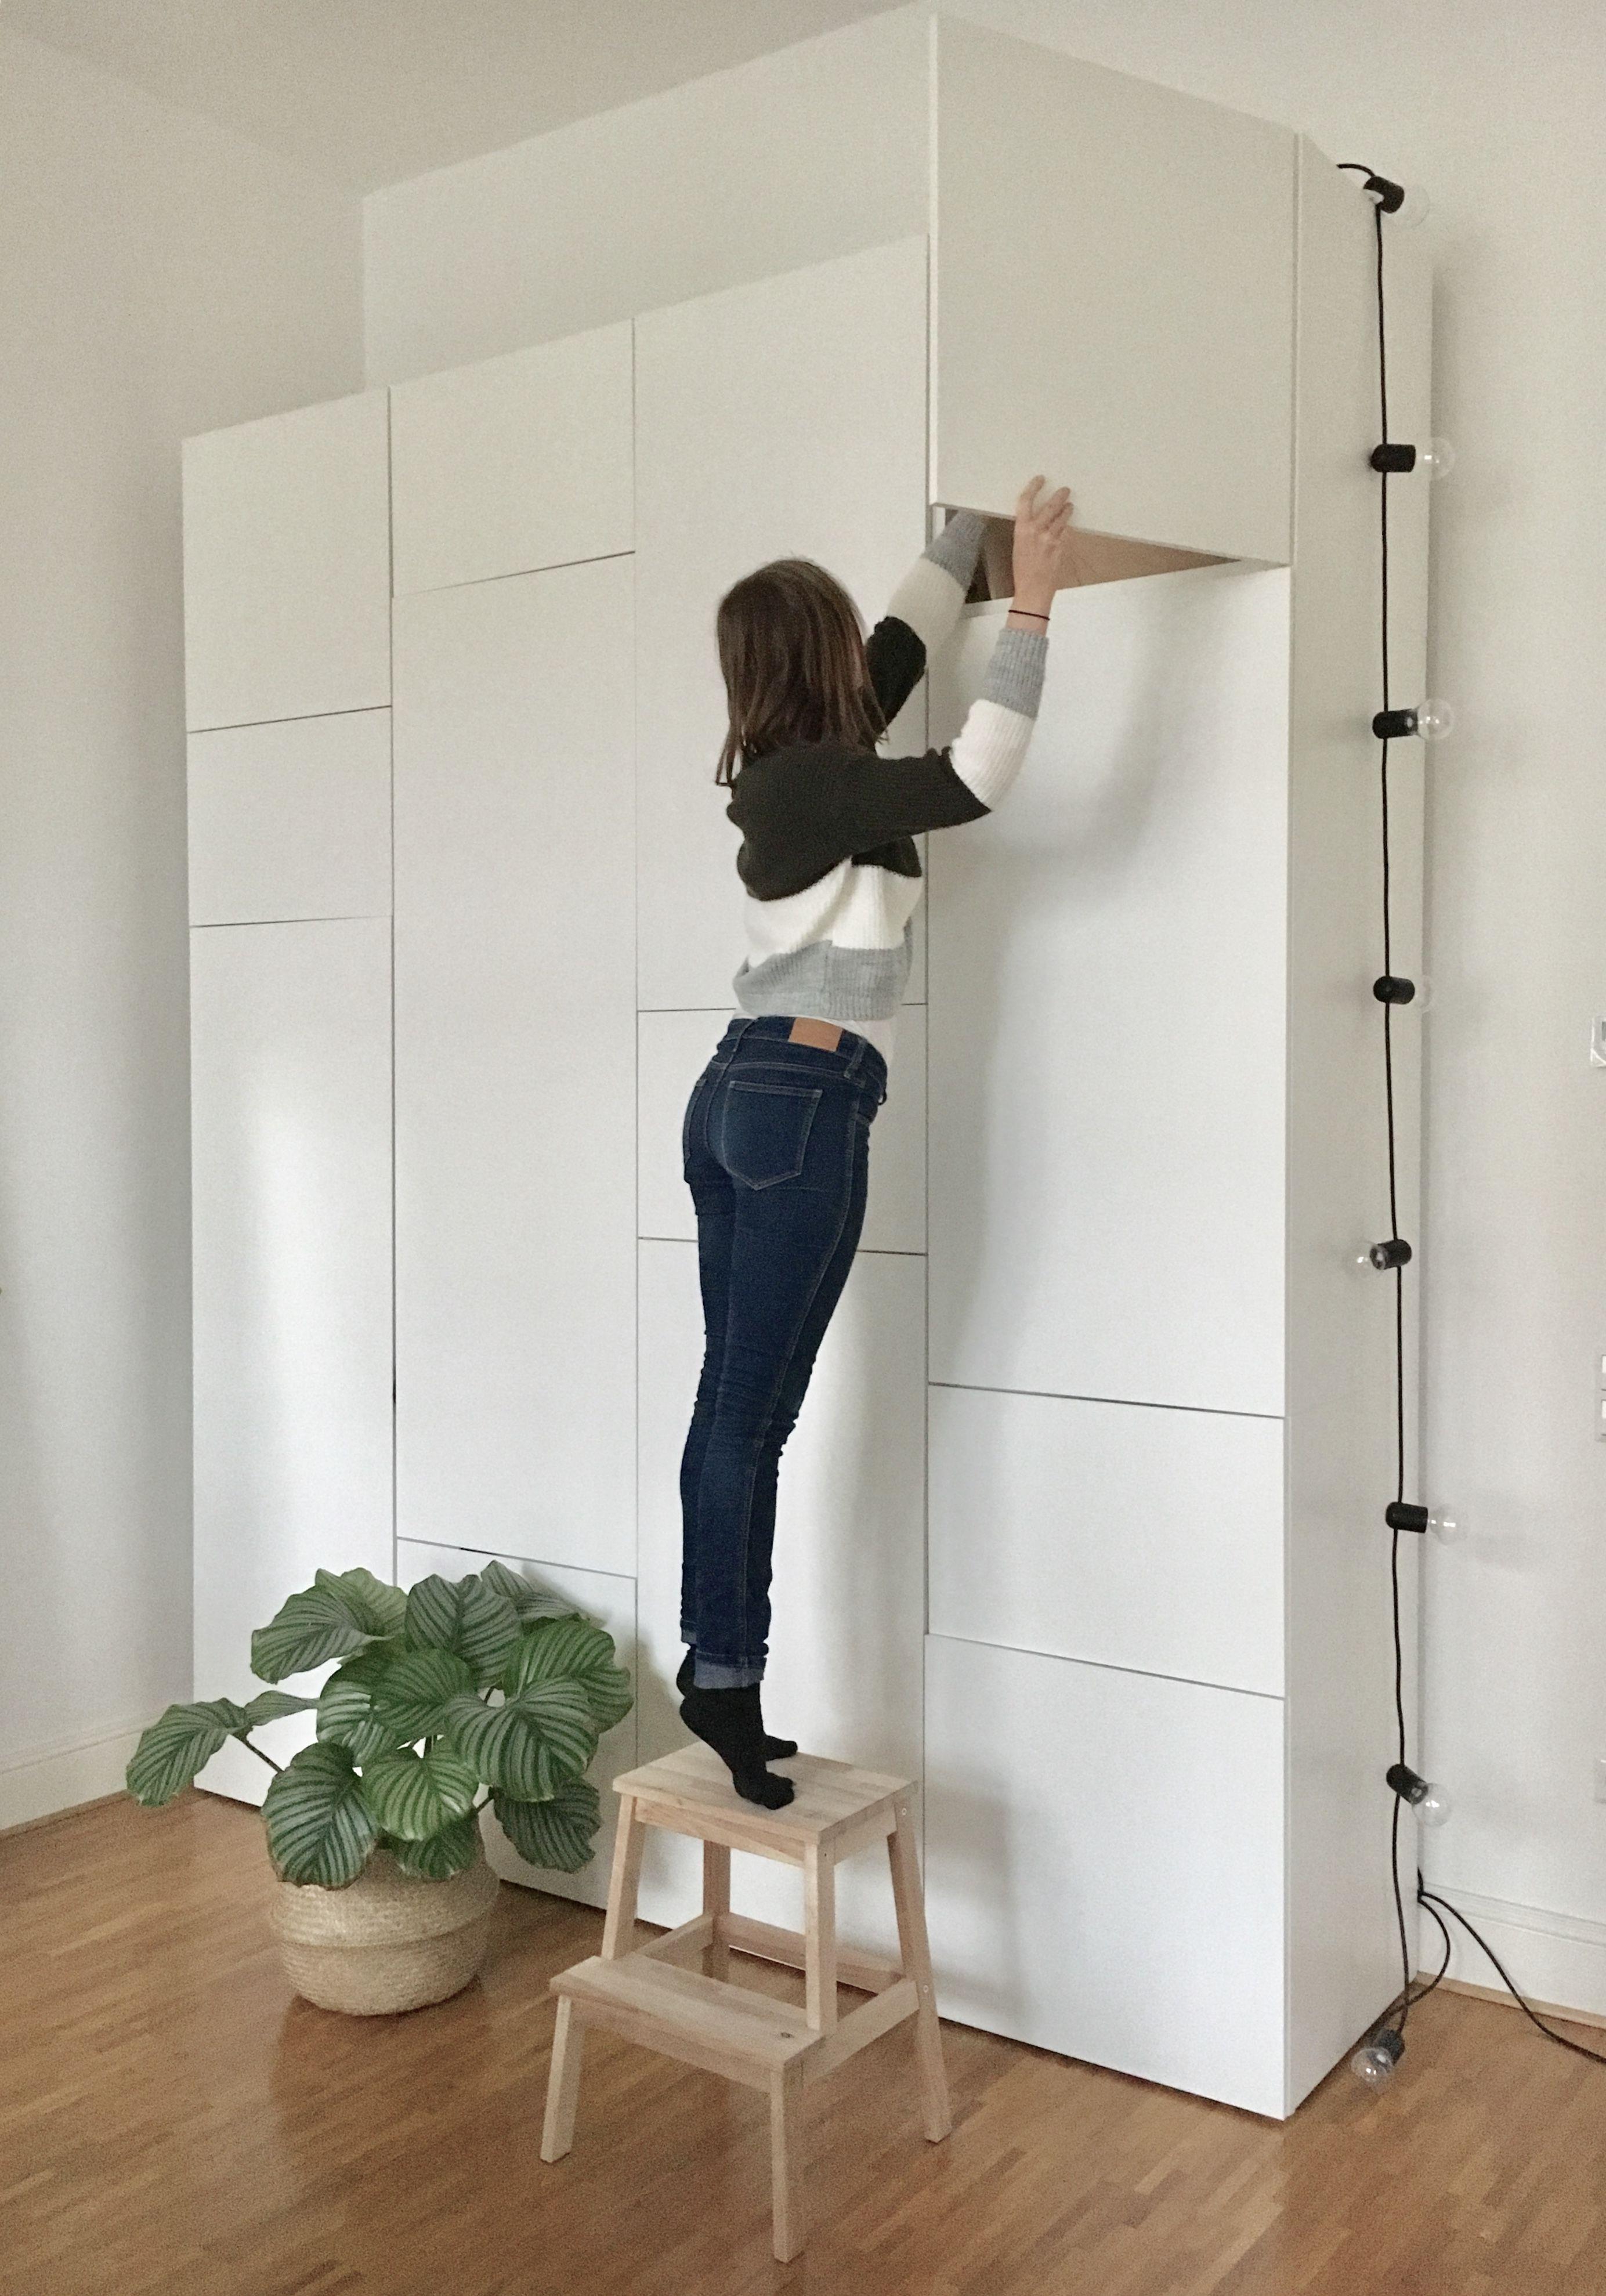 Ikea Platsa Create Your Own Combination Nordic Minimalist Aufbewahrung Wohnzimmer Badezimmer Ideen Ikea Ikea Ideen